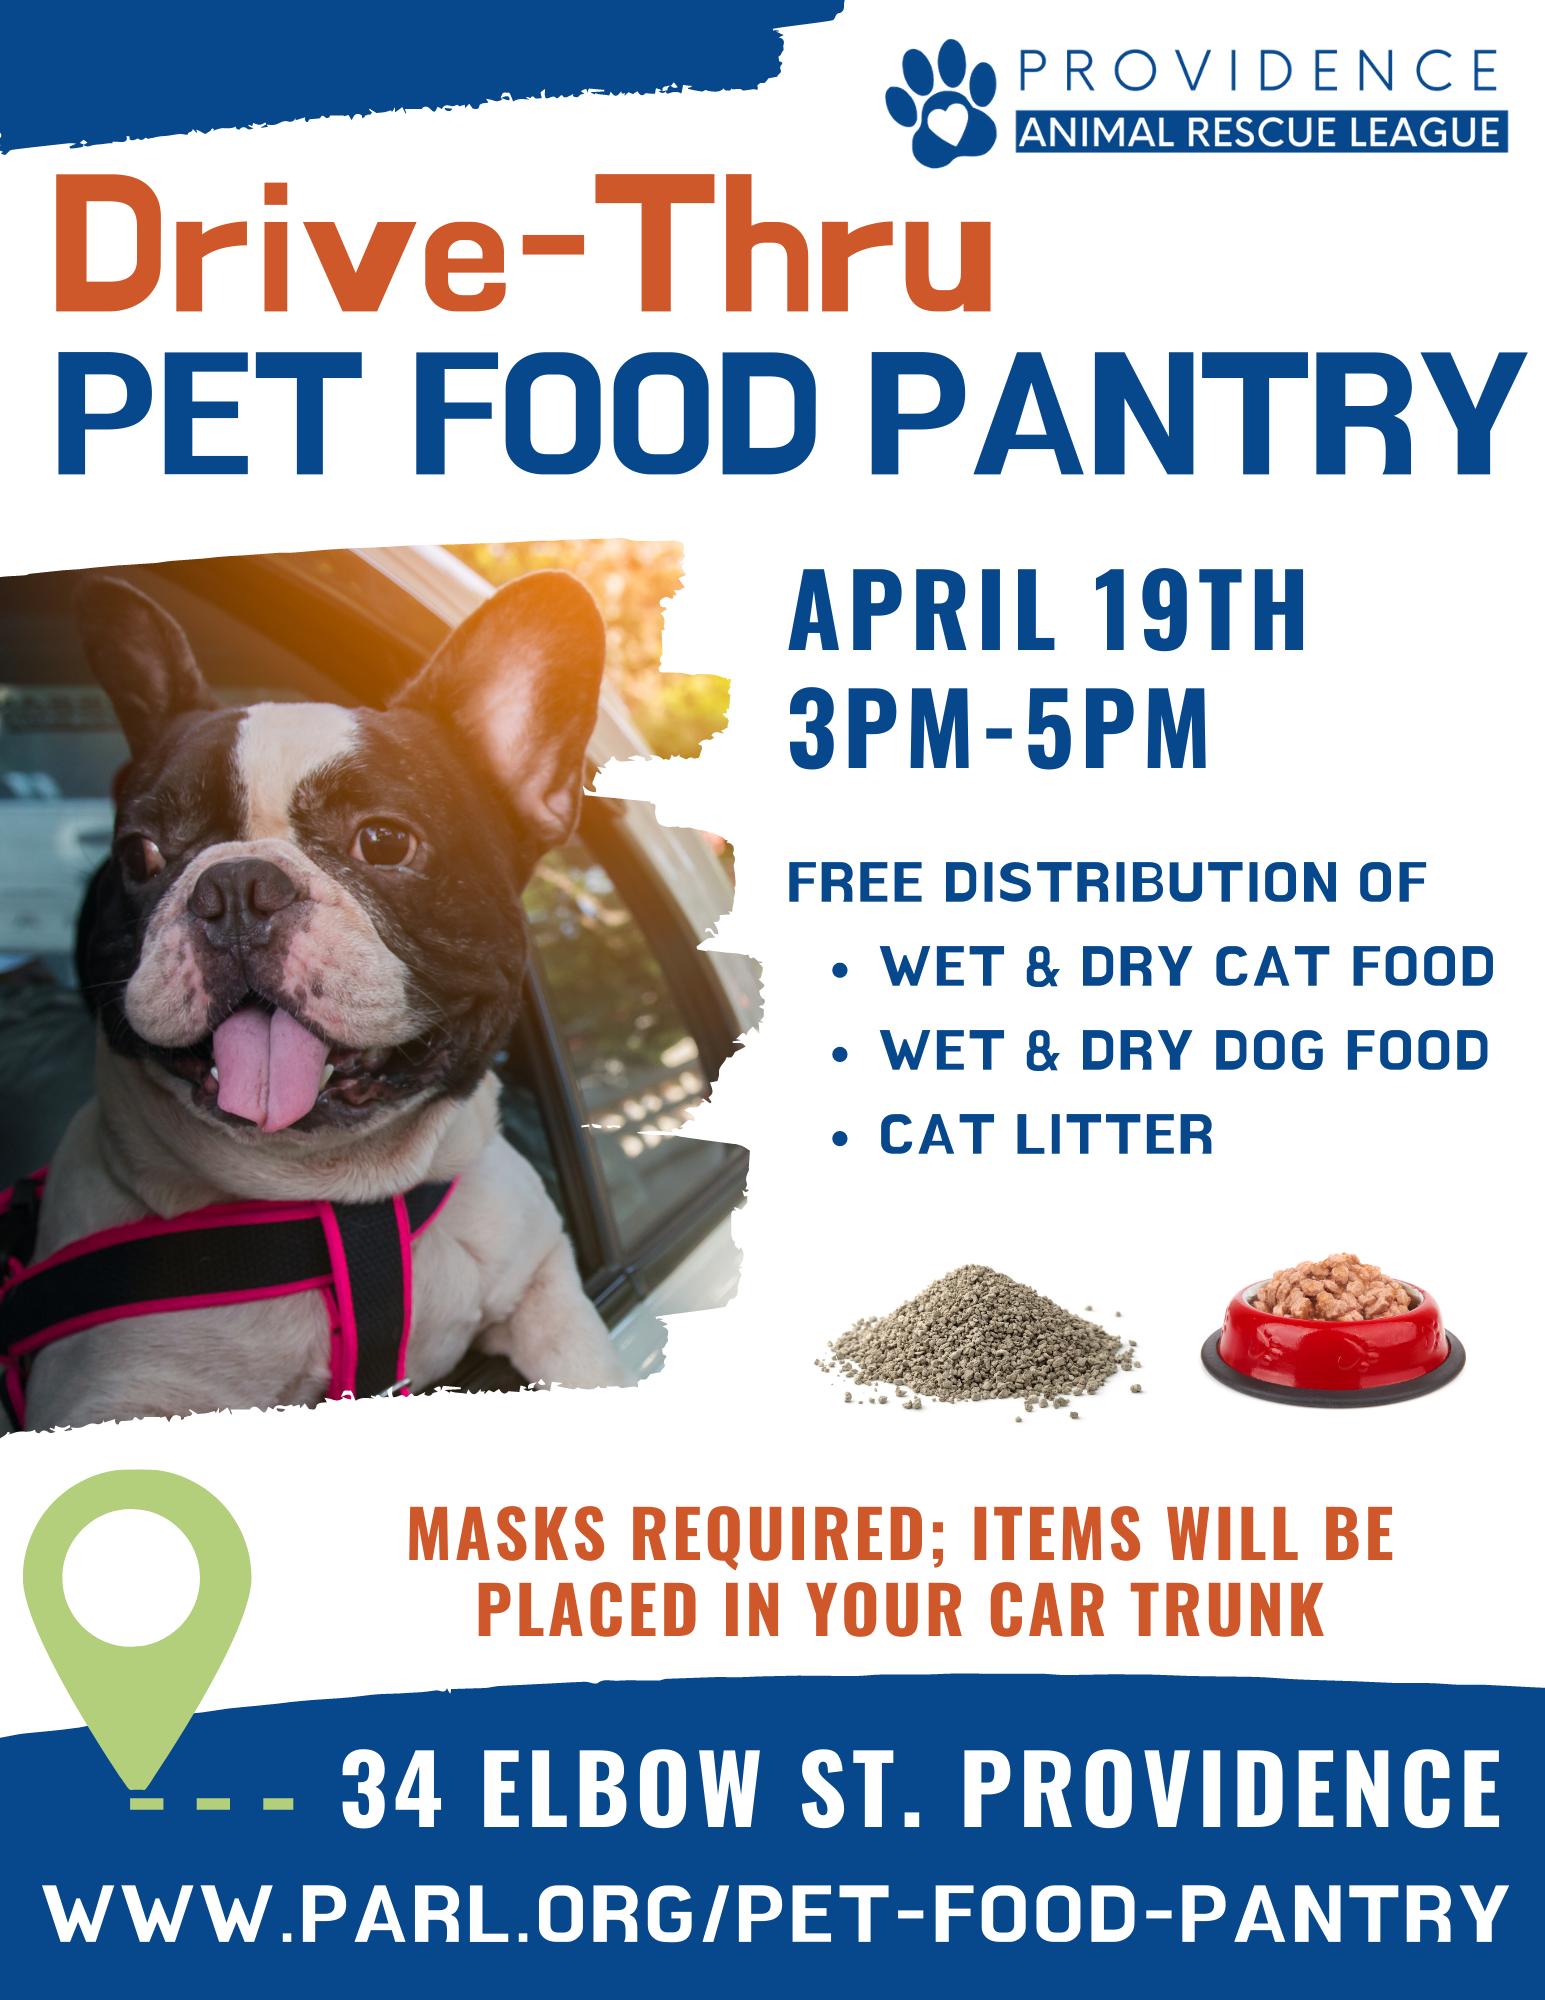 Pet Food Pantry Poster for April 19th, 3-5pm